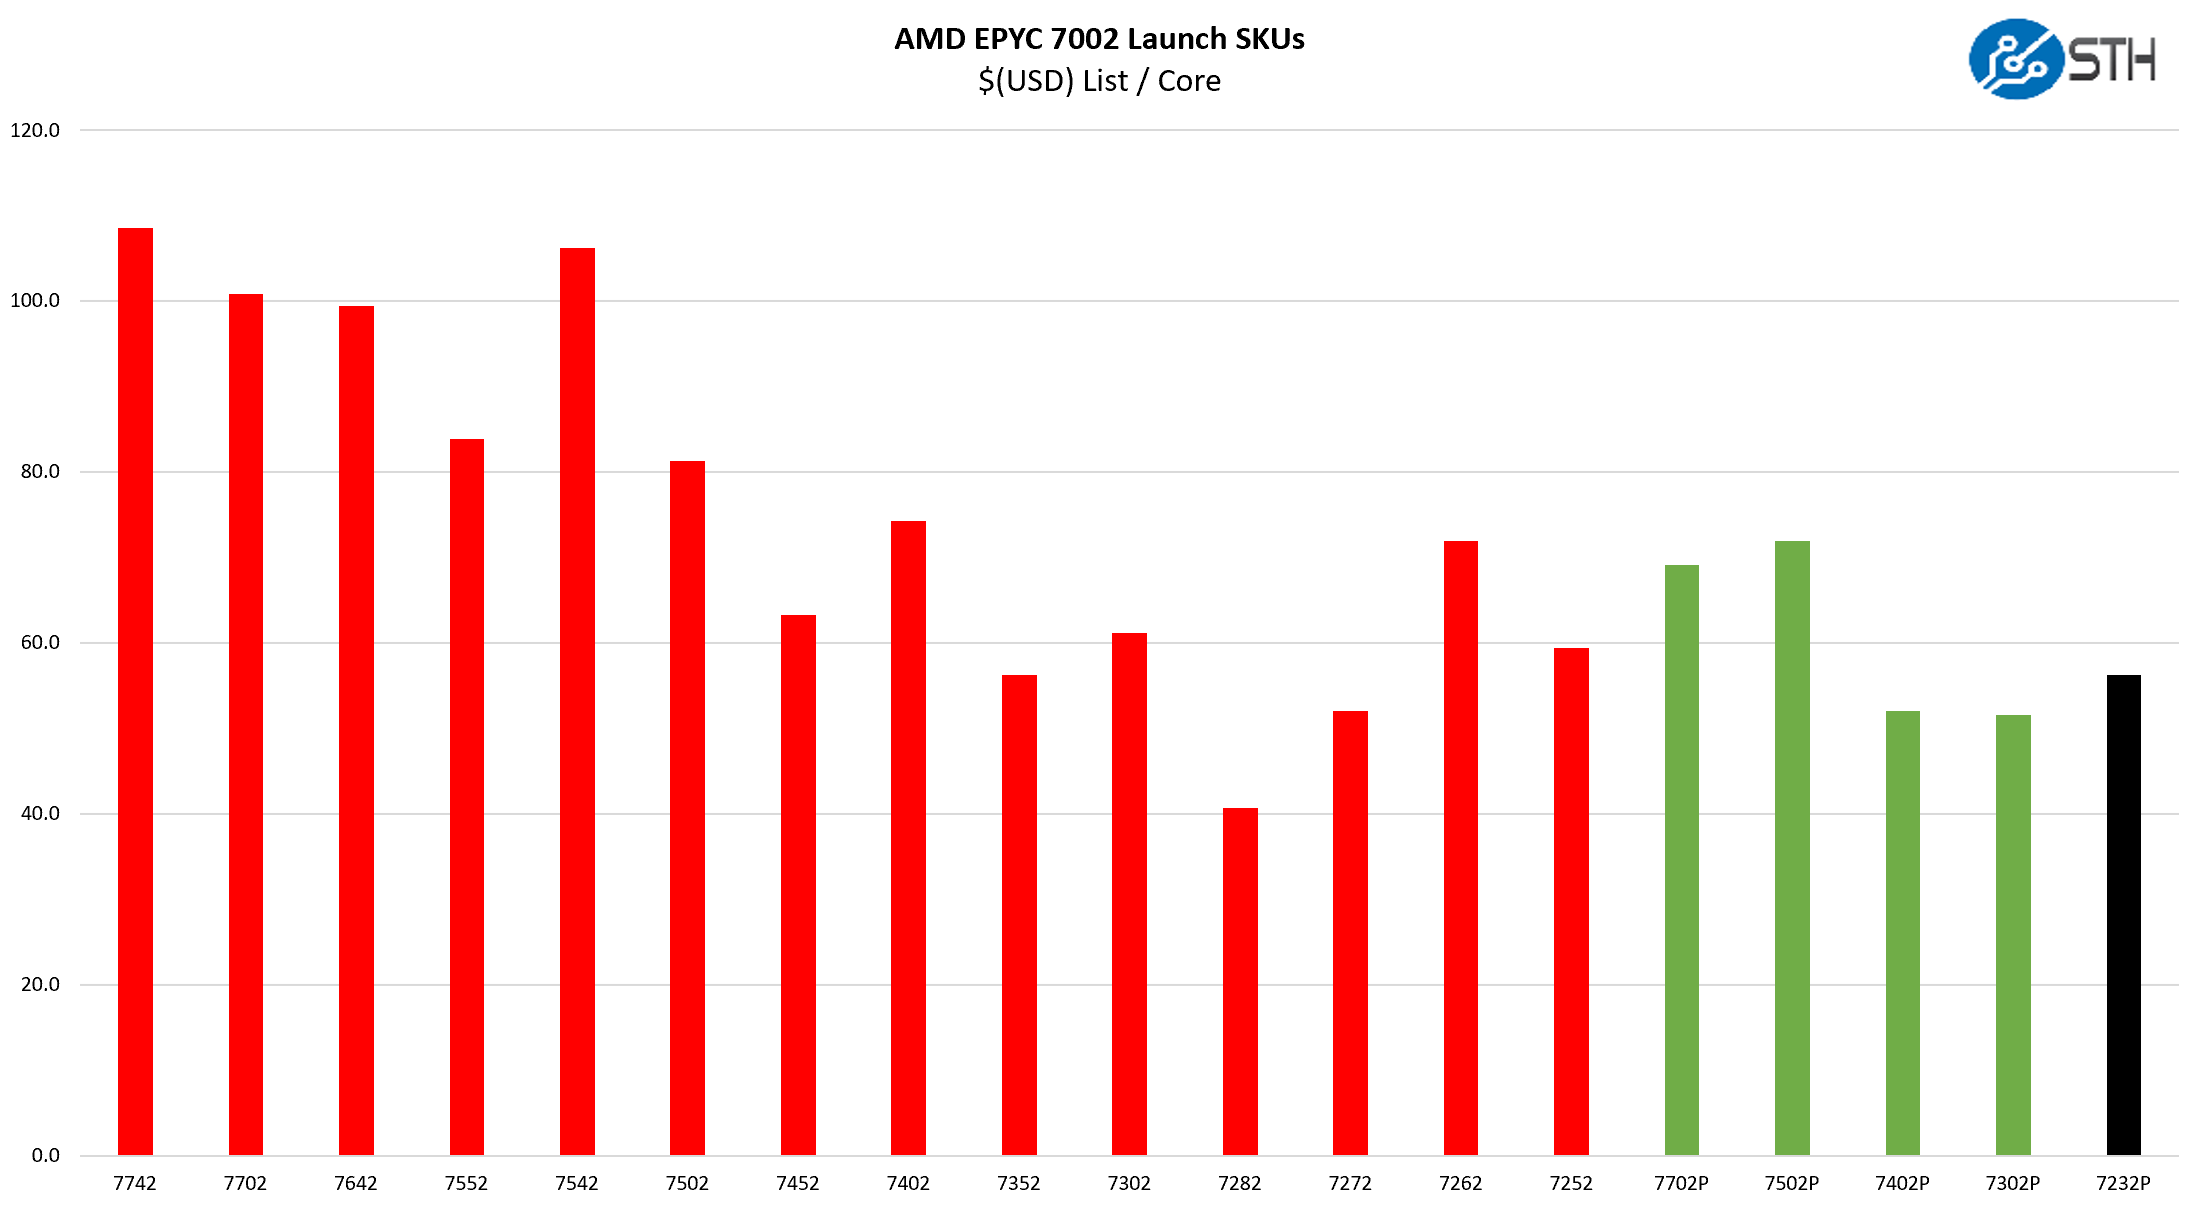 AMD EPYC 7232P Compared To AMD Alternatives